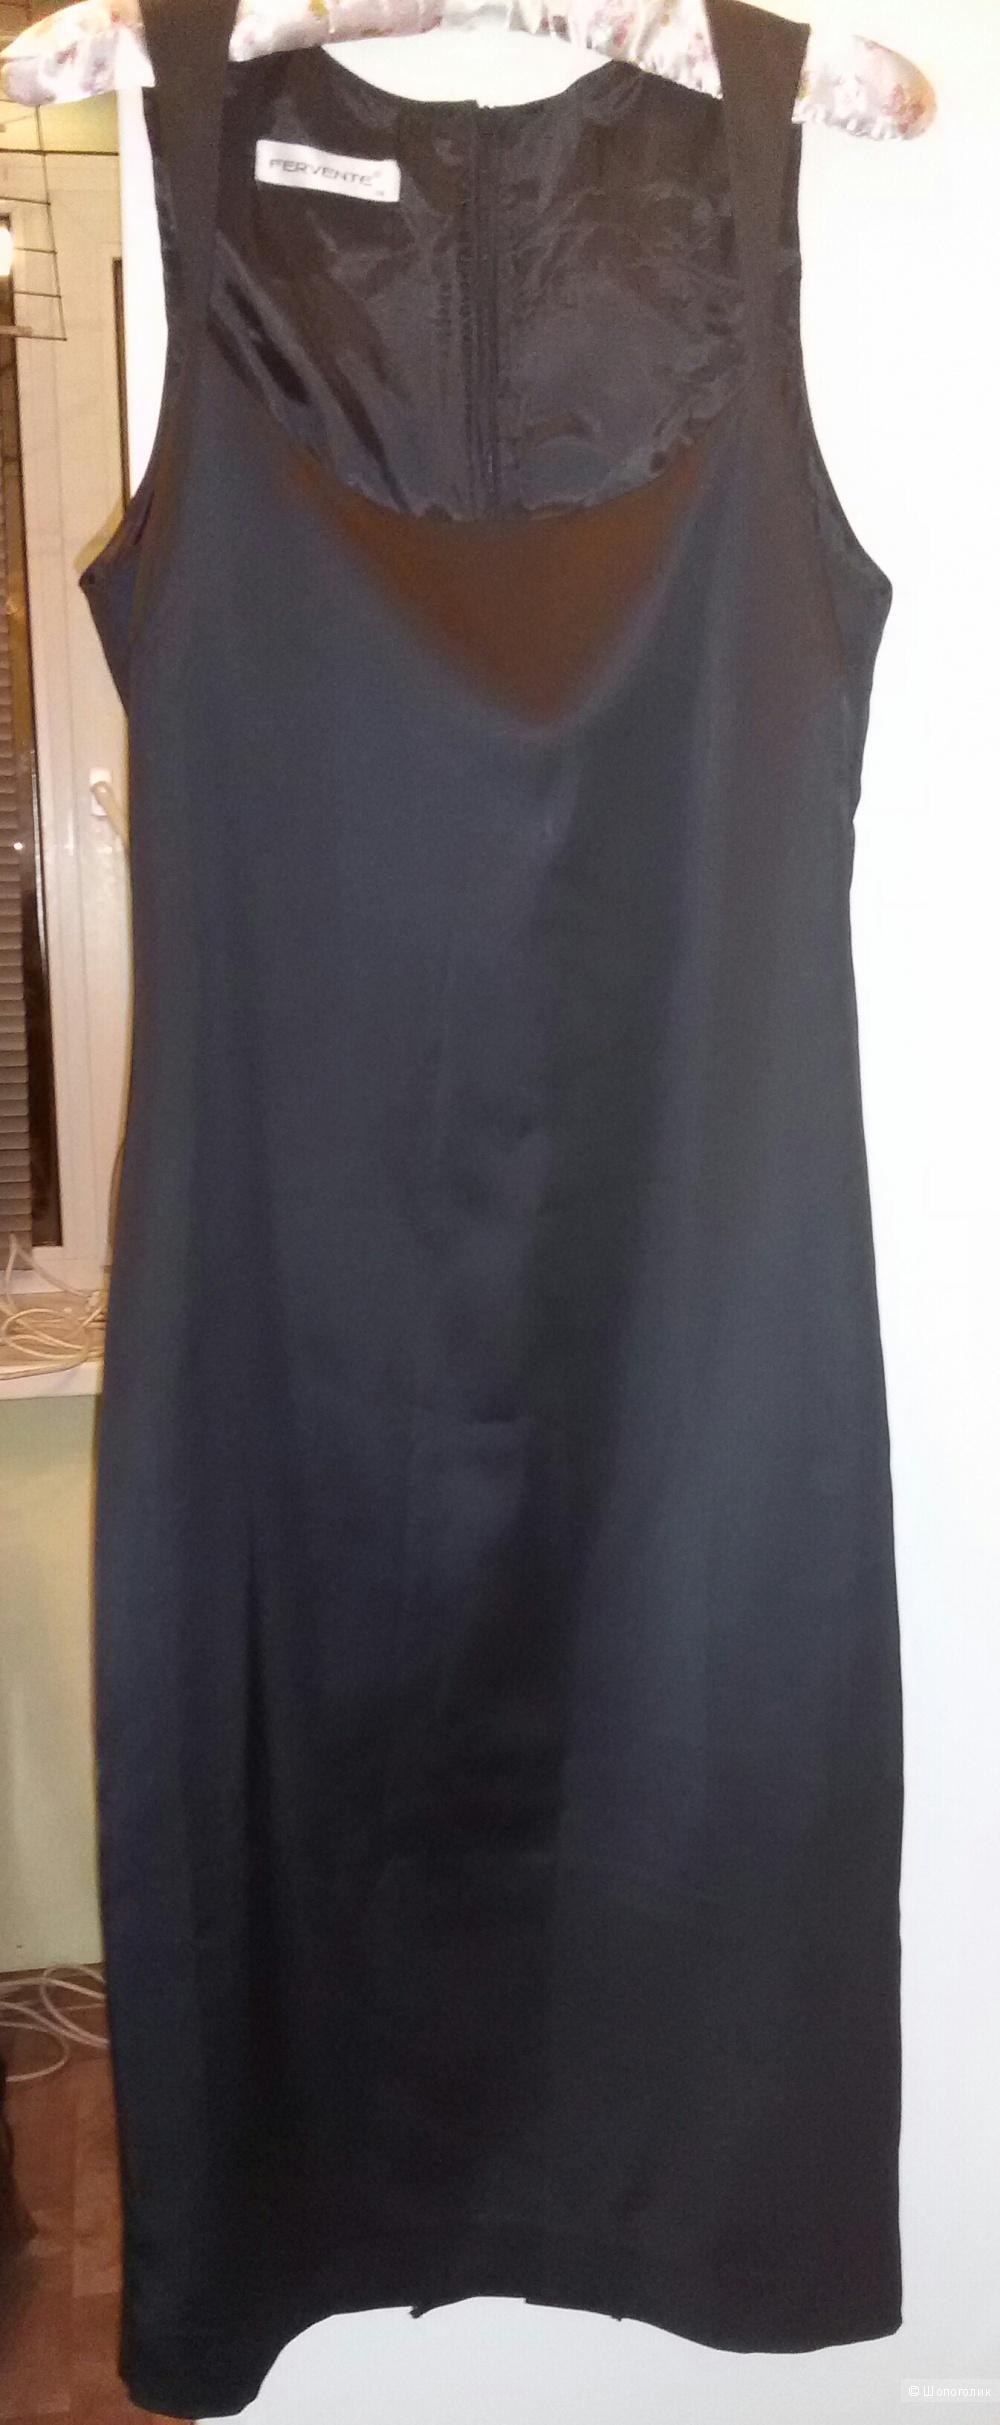 Платье Fervente, размер 44